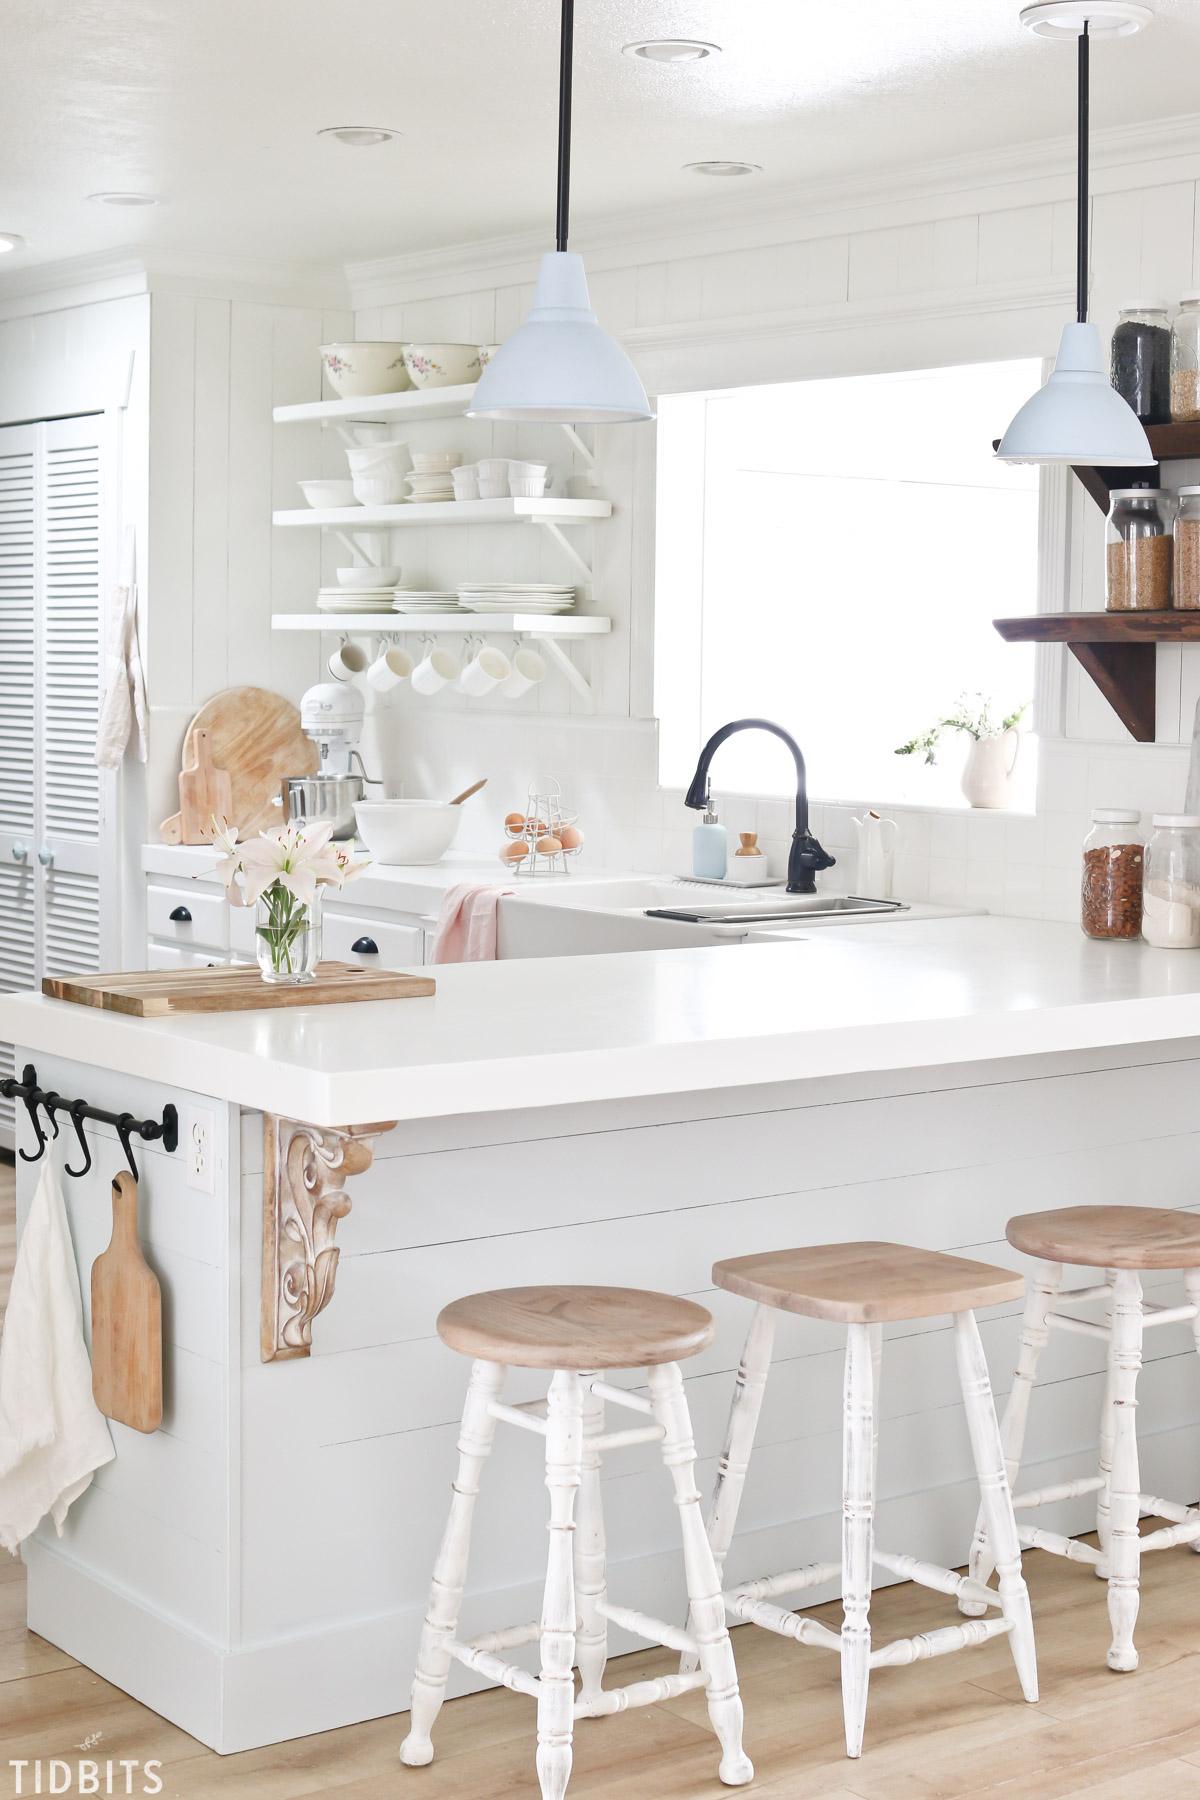 Spring Kitchen Refresh5  Tidbits